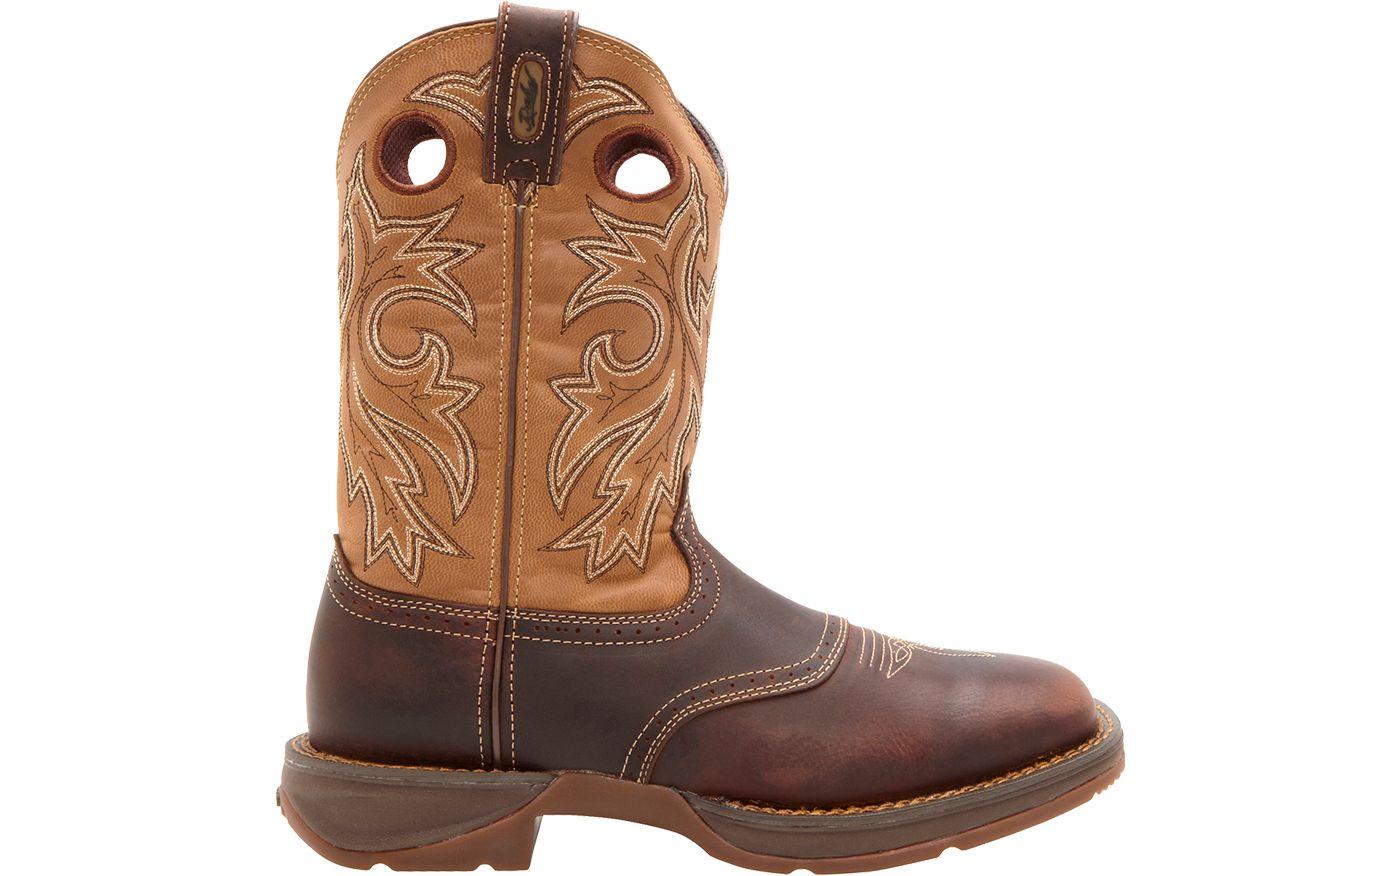 Durango Men's Rebel Saddle Up Western Work Boots